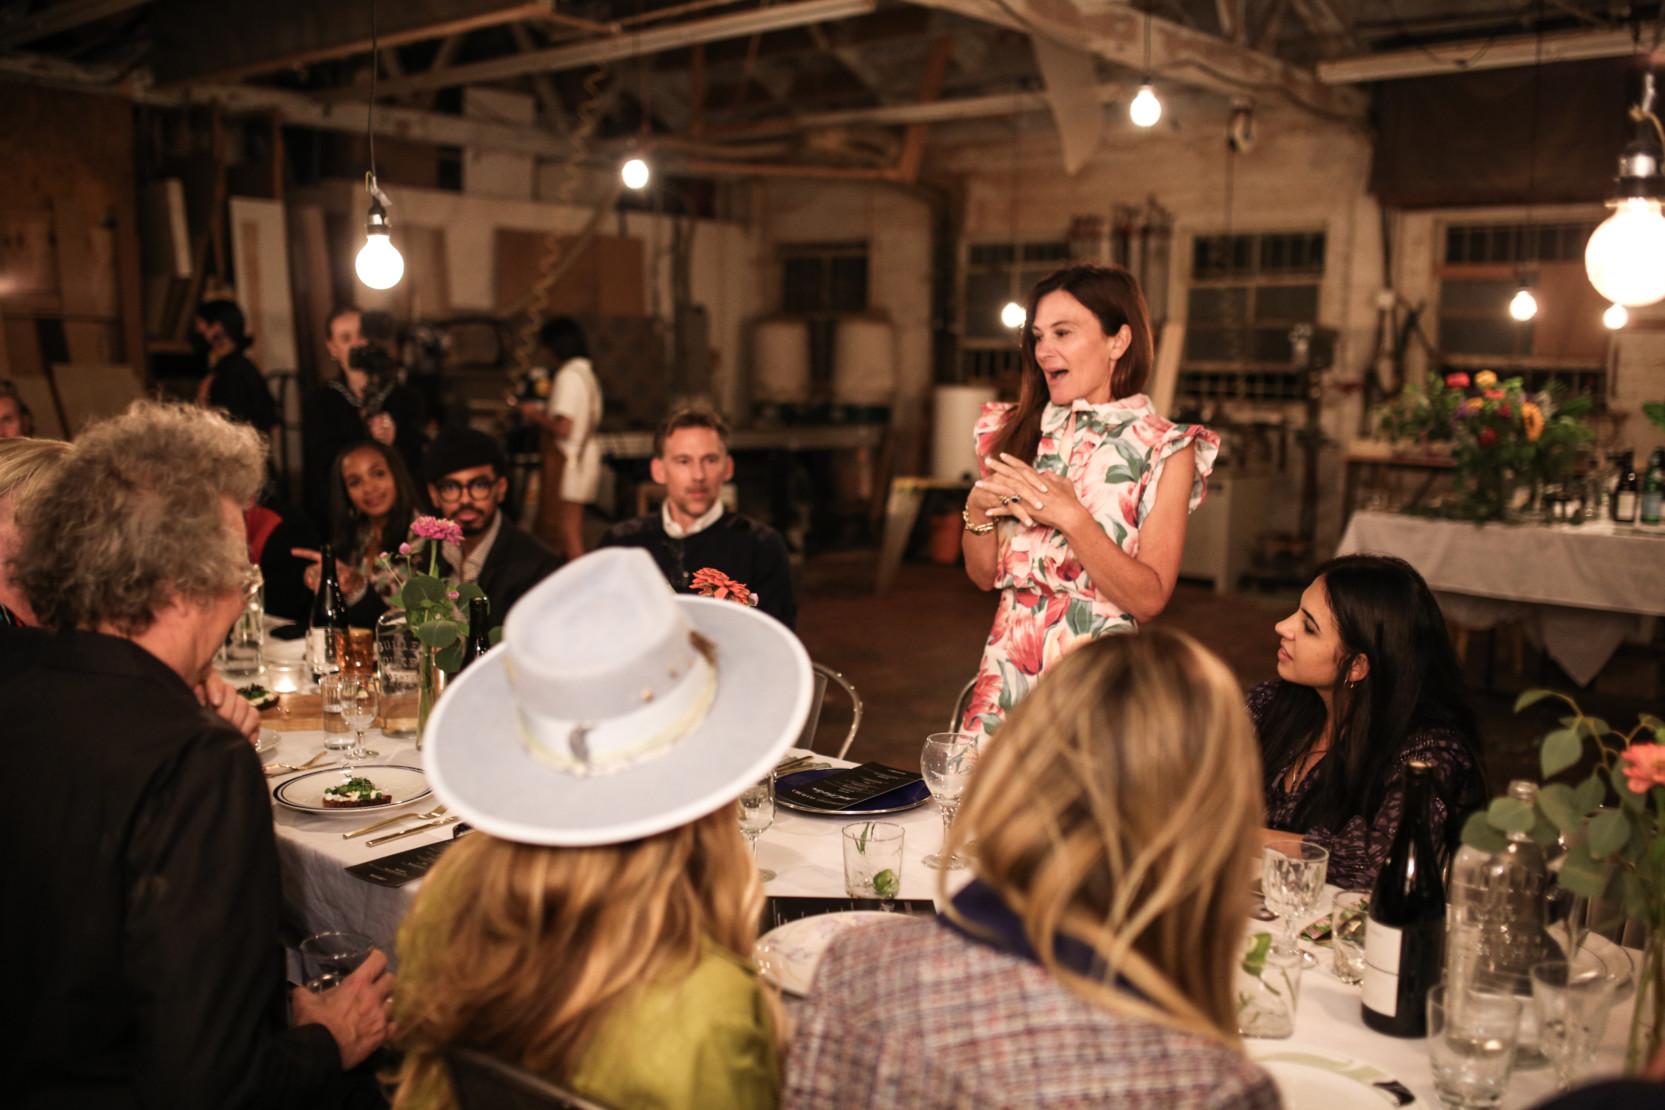 Sarah Harrelson addresses the dinner guests.